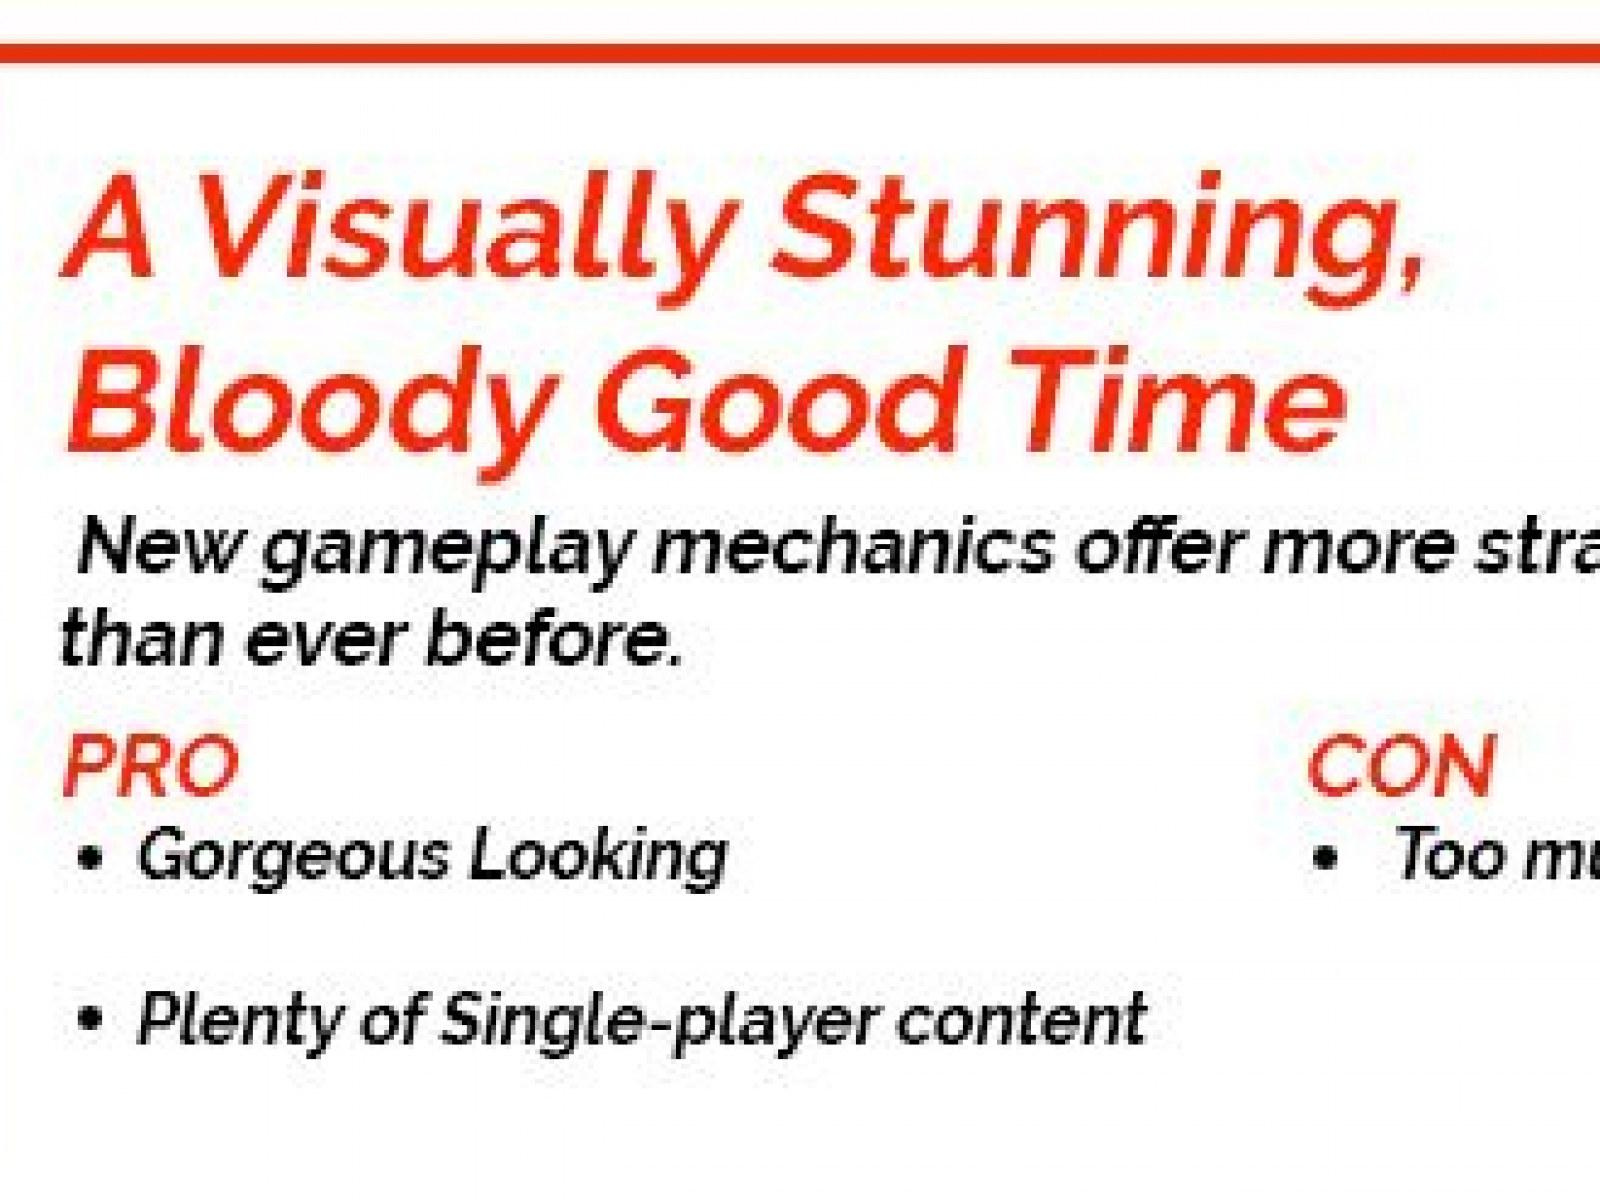 Mortal Kombat 11' Review: A Visually Stunning, Bloody Good Time